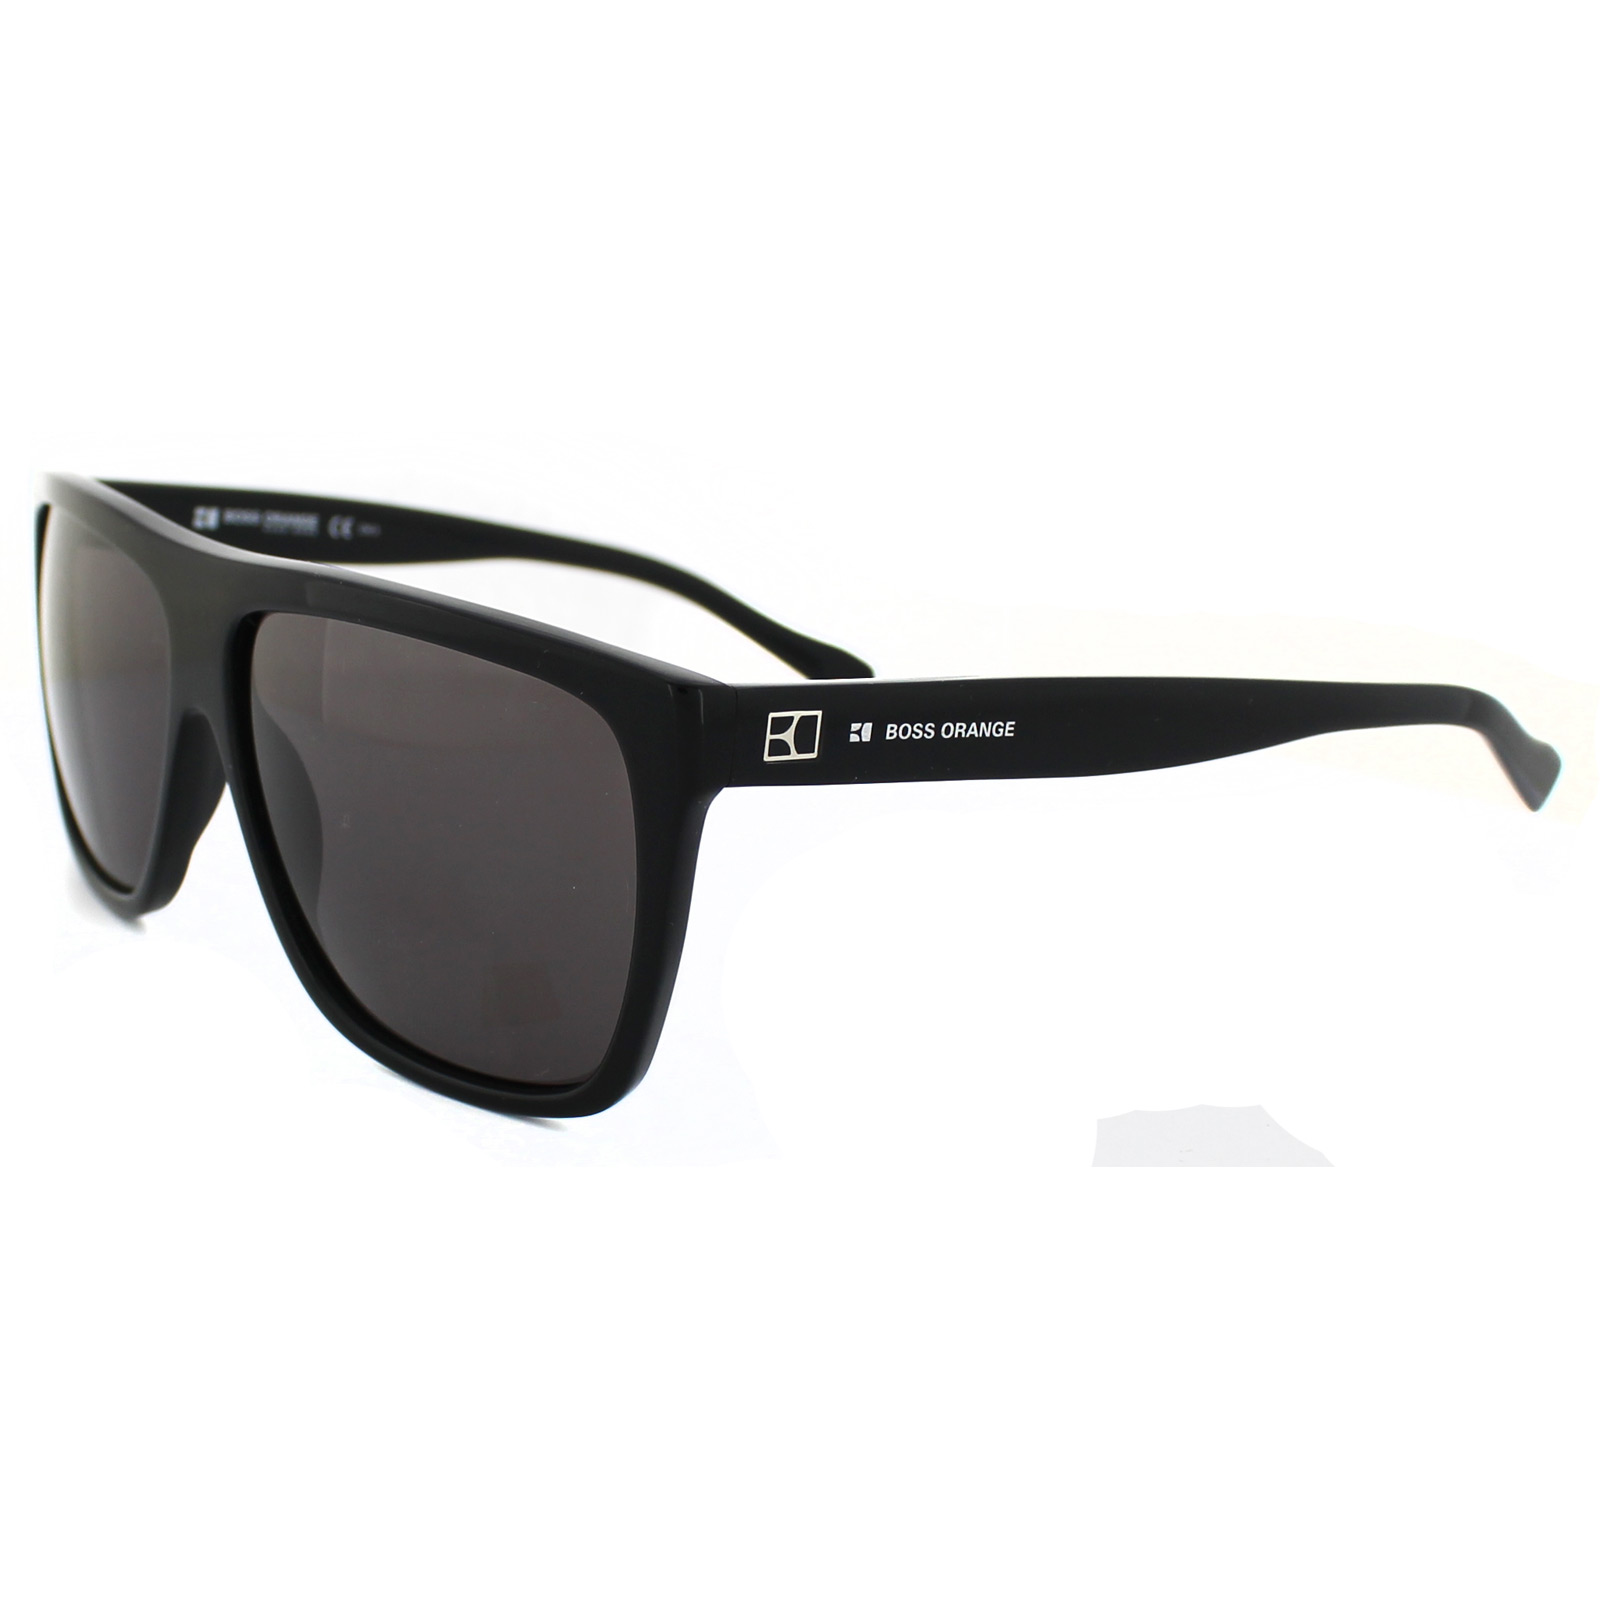 brown oakley sunglasses  boss sunglasses